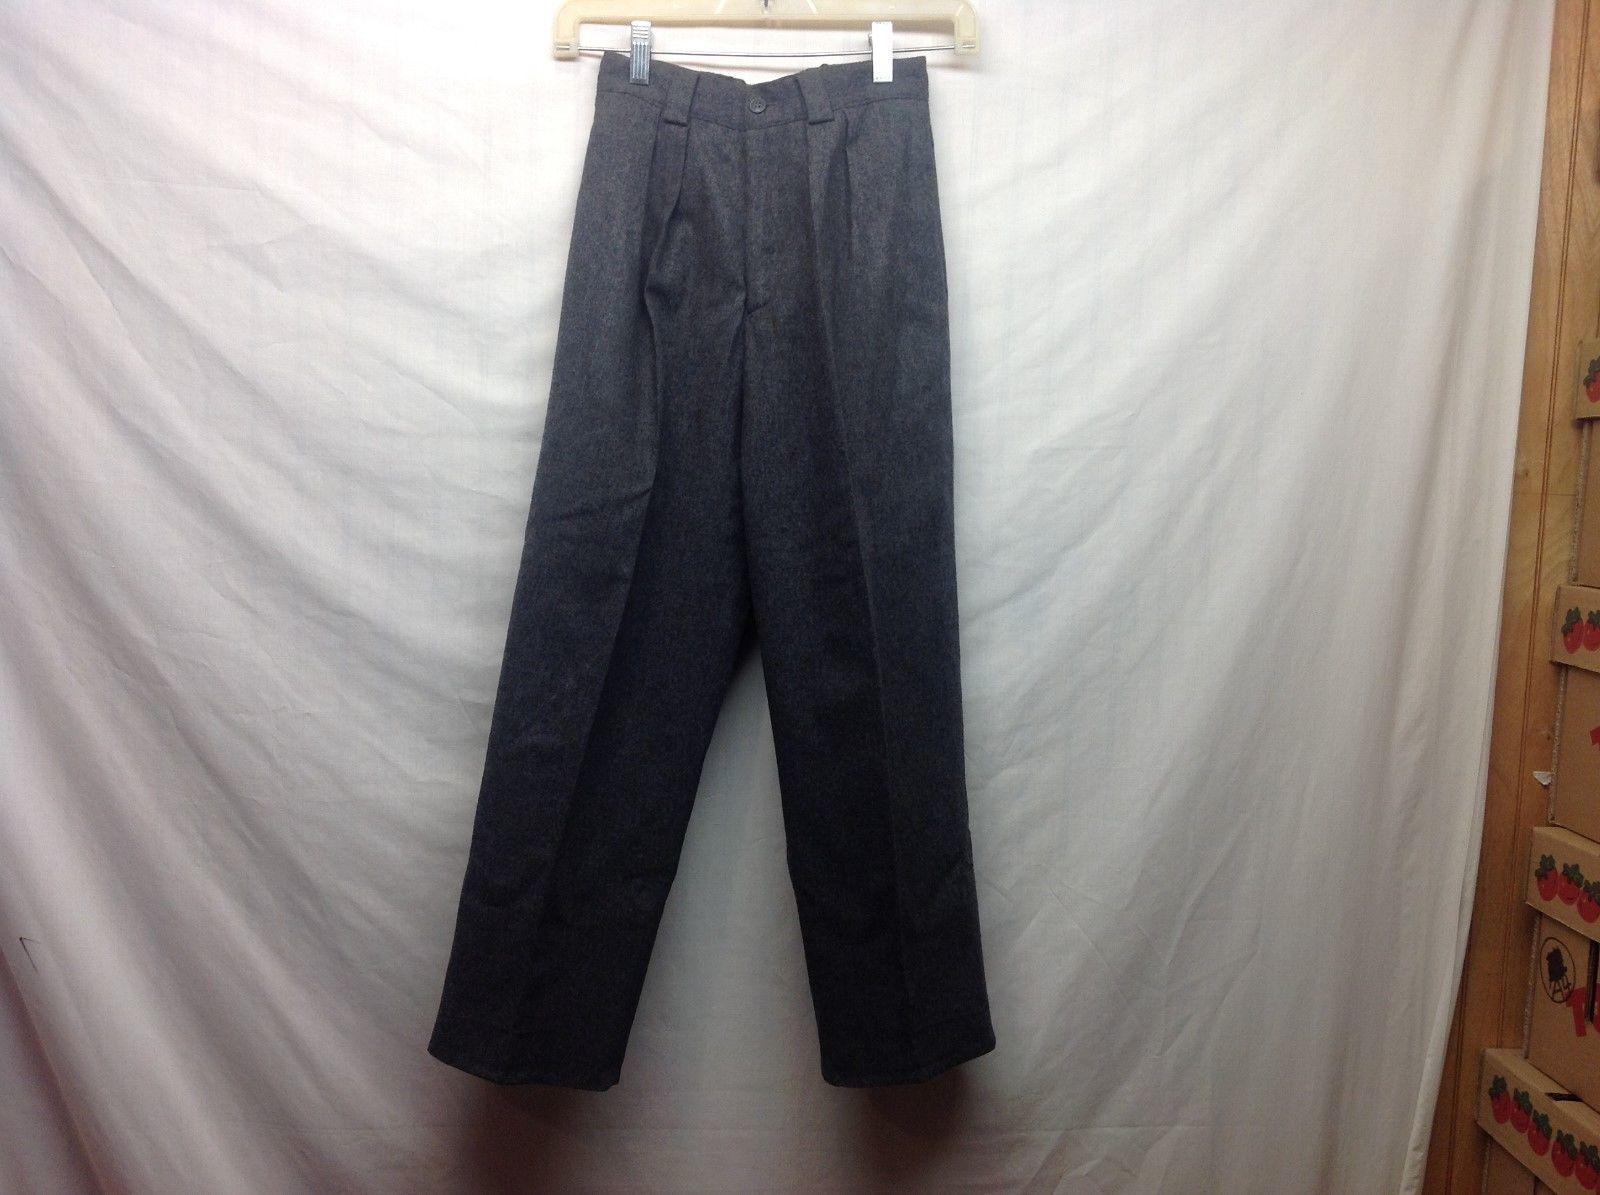 Petit Bateau Dark Dress Pants Sz 10ANS/138